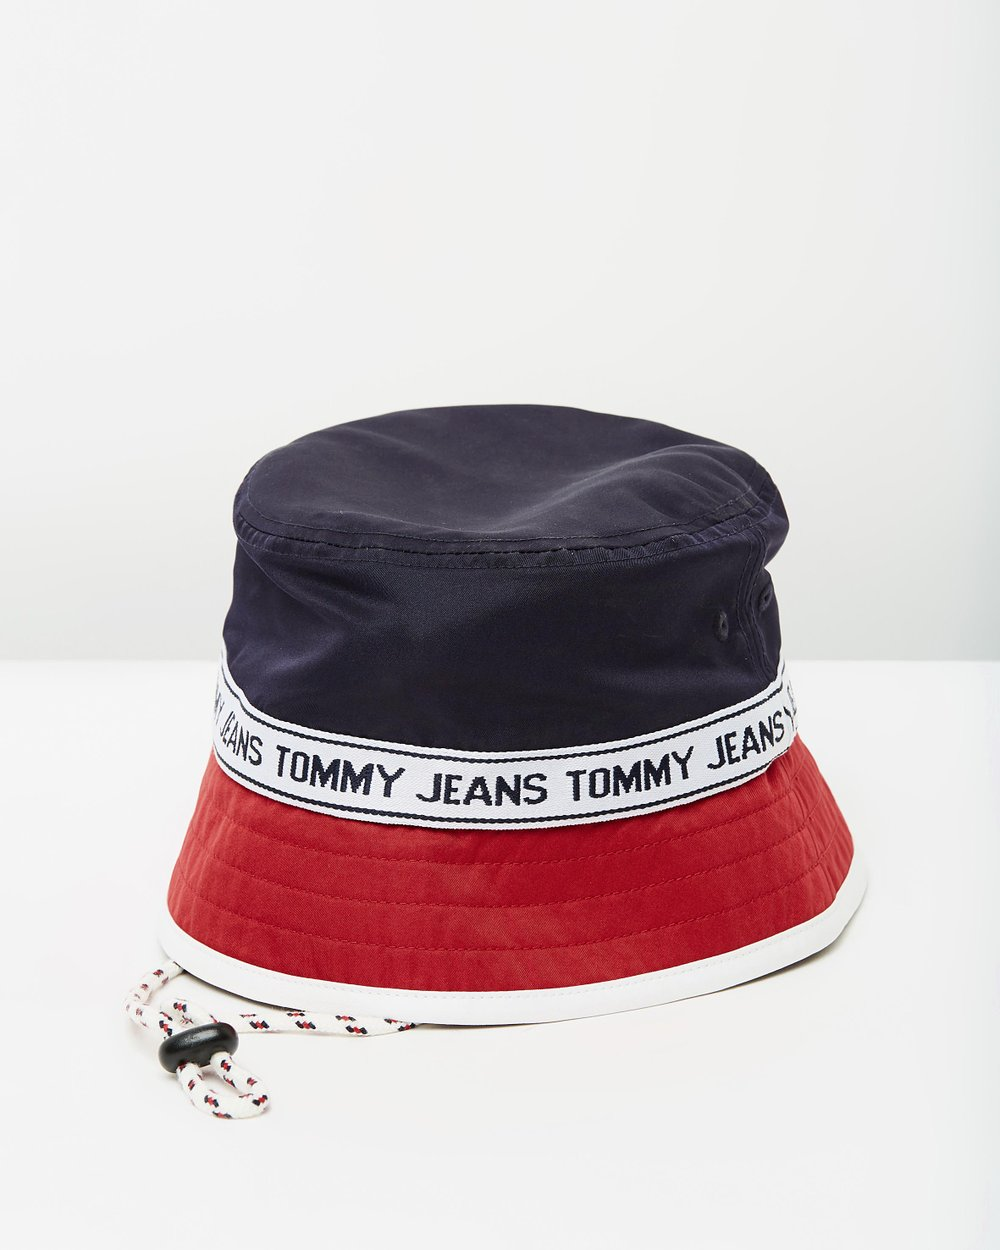 Tommy Jeans Logo Bucket Hat by Tommy Jeans Online  02fe7b8df35b